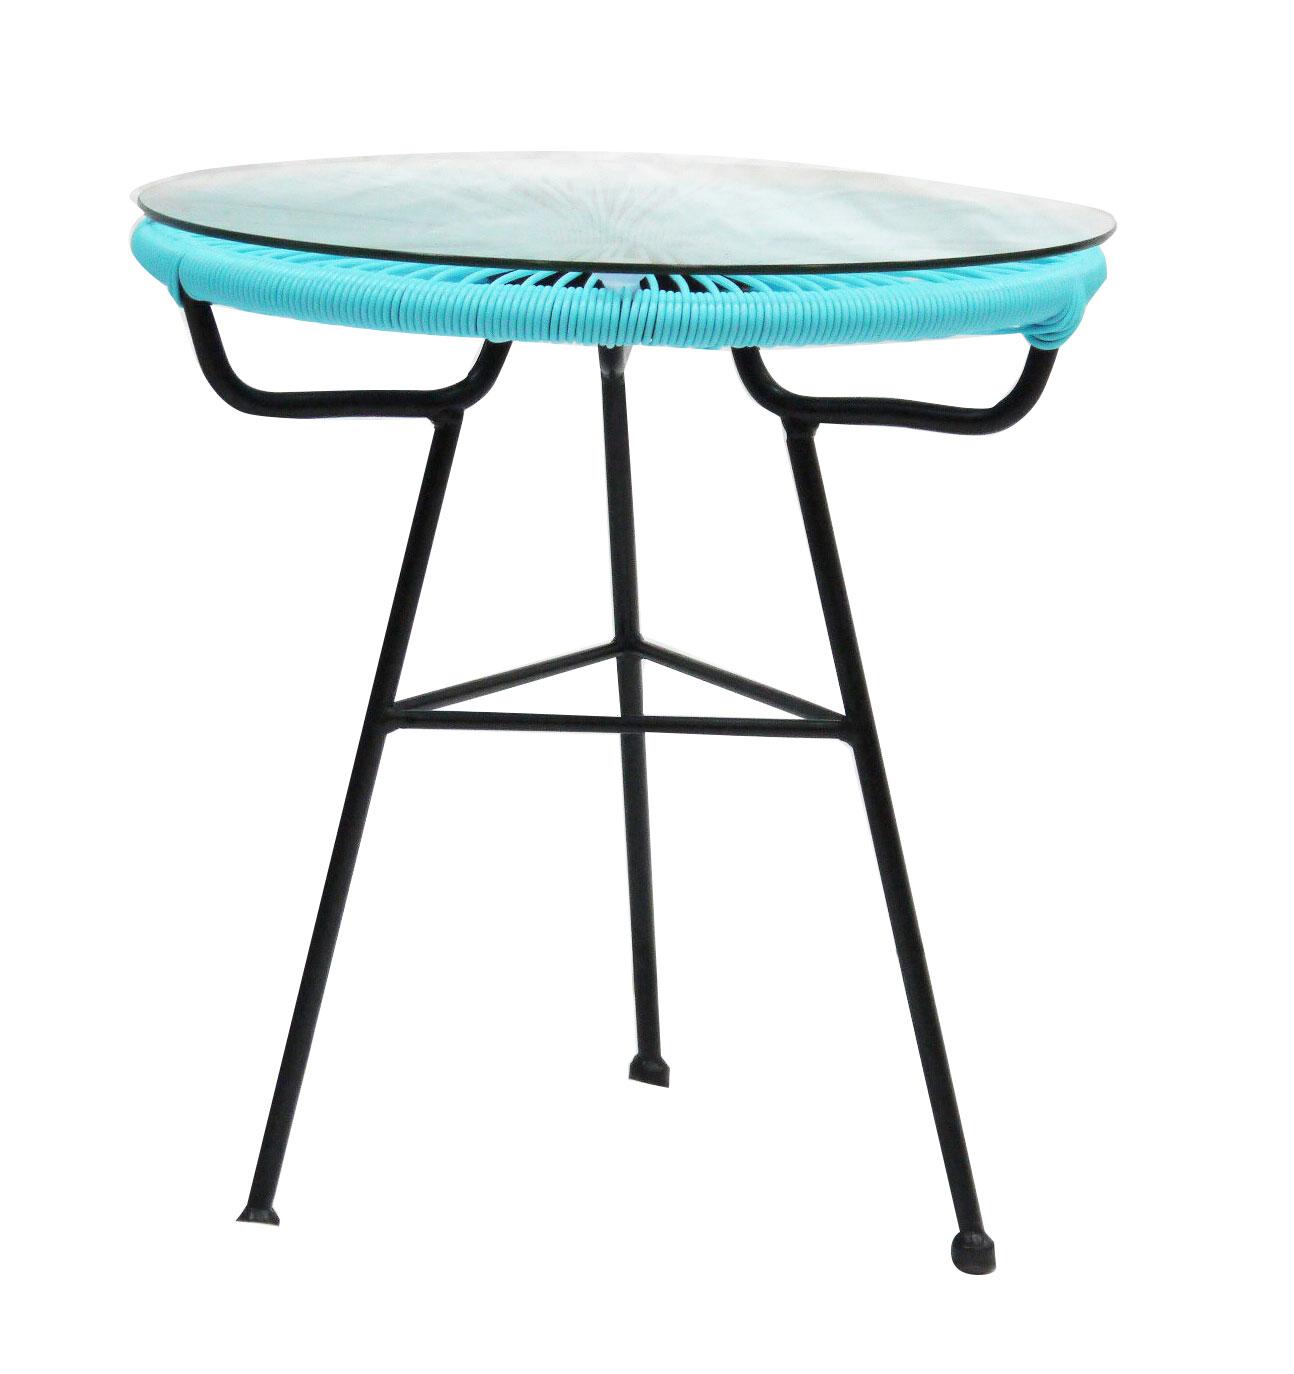 Bentley Garden Retro Round Table Salon Rotin Furniture